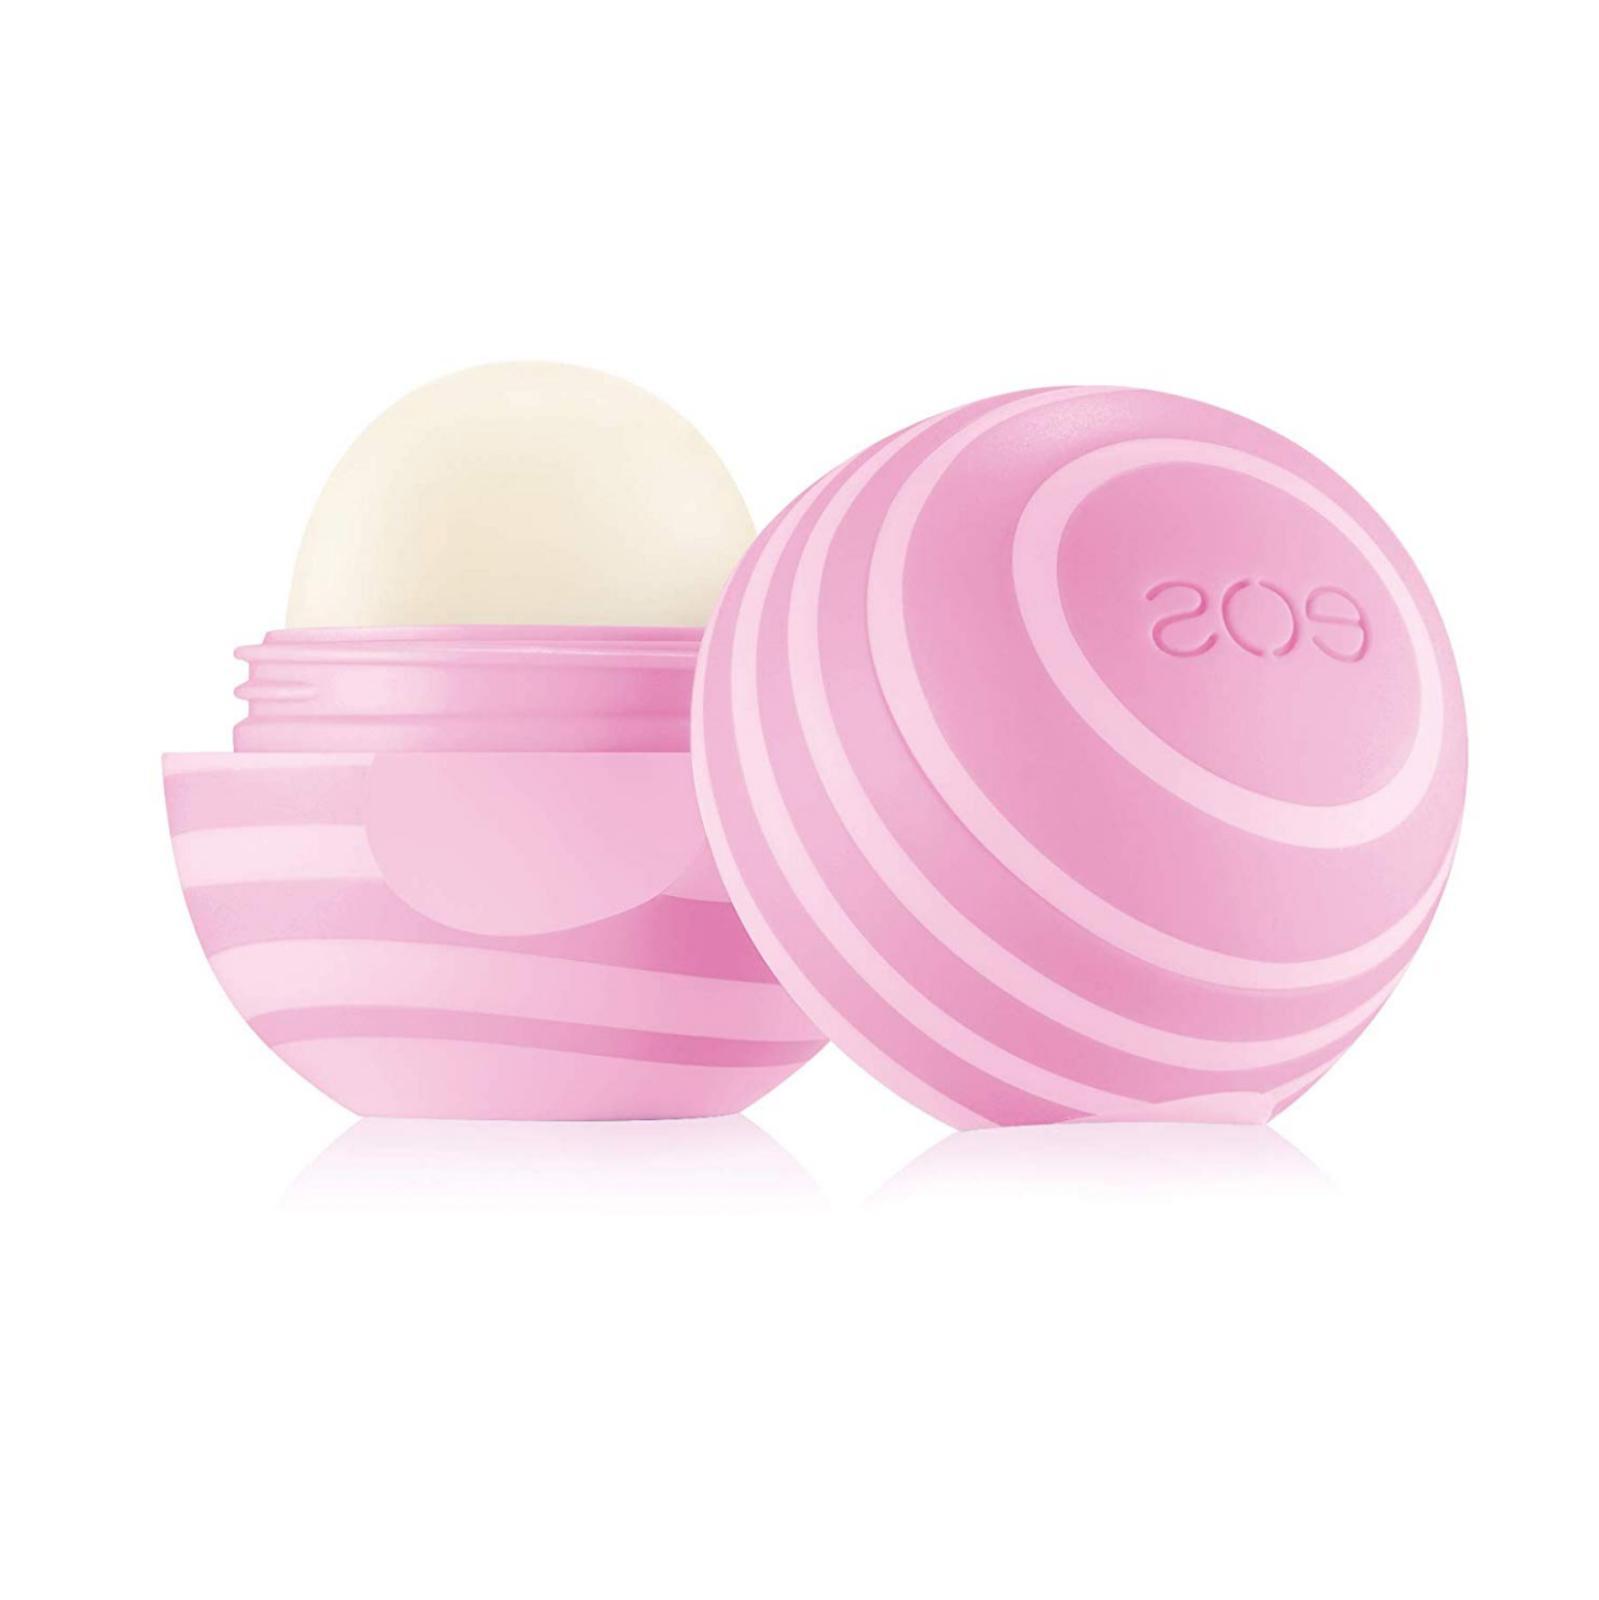 Lip EOS Sweet sphere Chapstick Moisturizing Vanilla